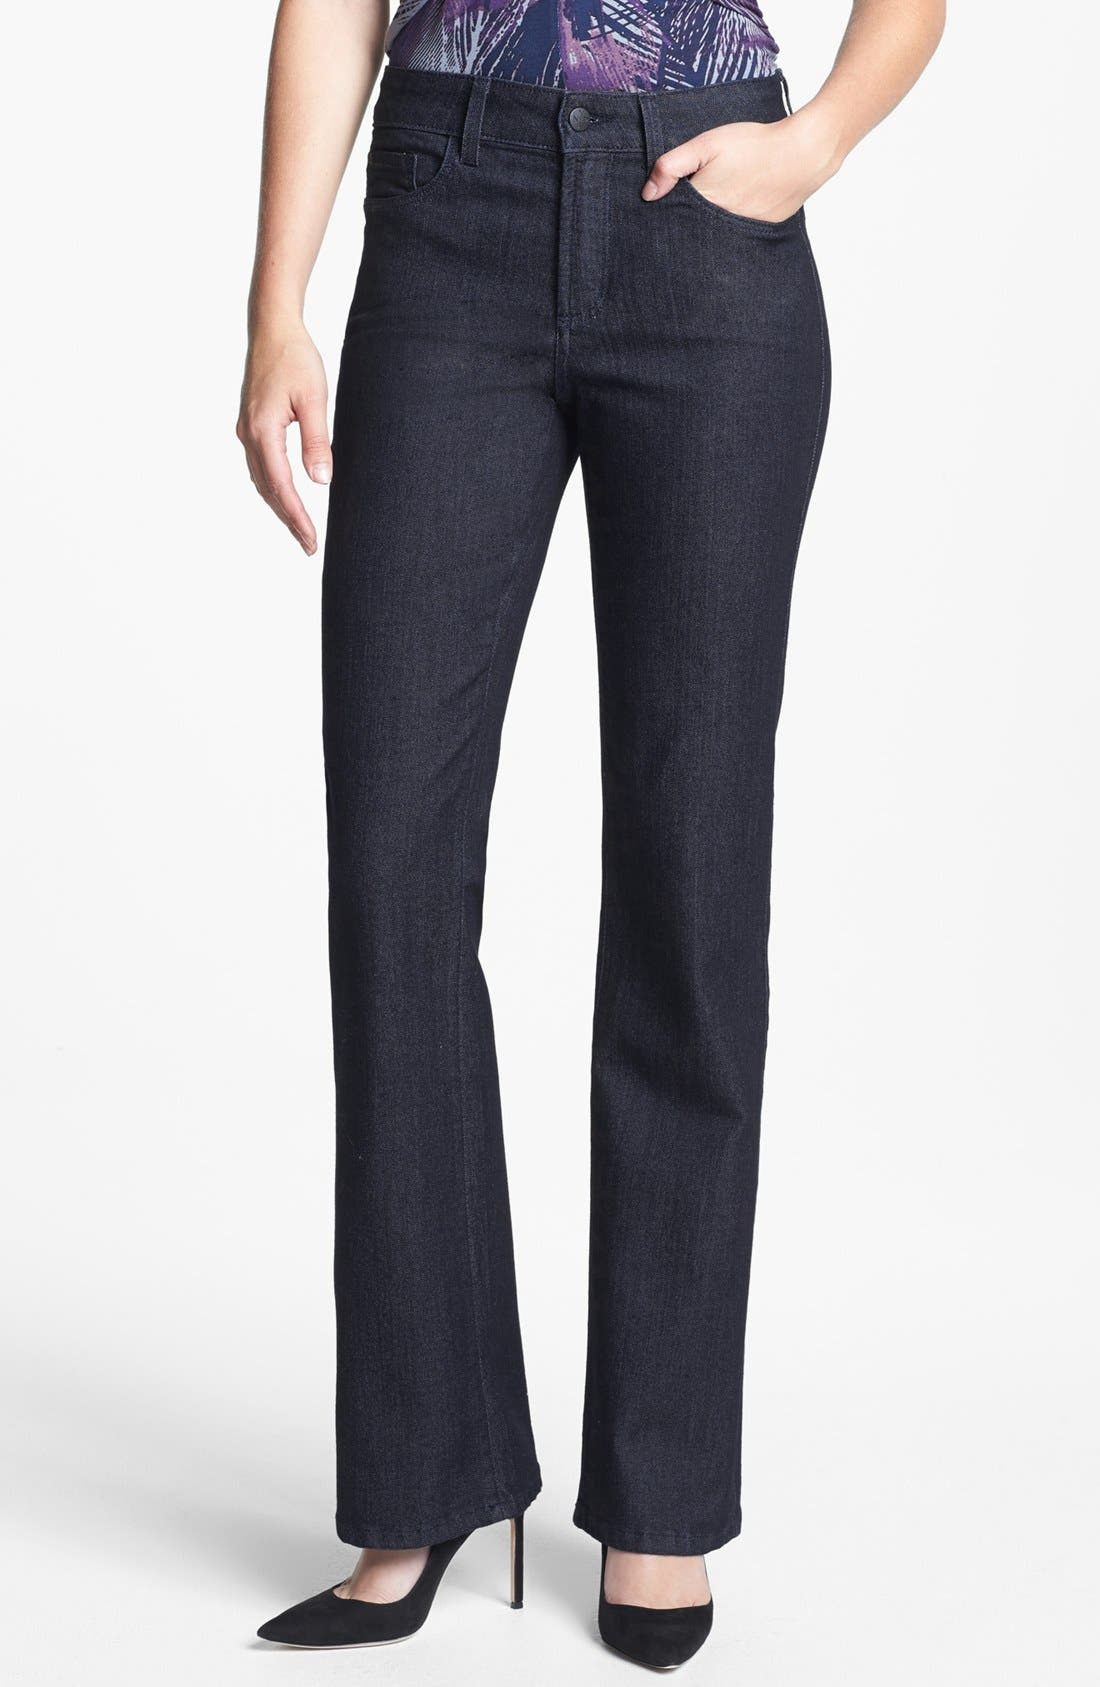 Alternate Image 1 Selected - NYDJ 'Barbara' Embellished Bootcut Jeans (Dark Enzyme) (Regular & Petite)